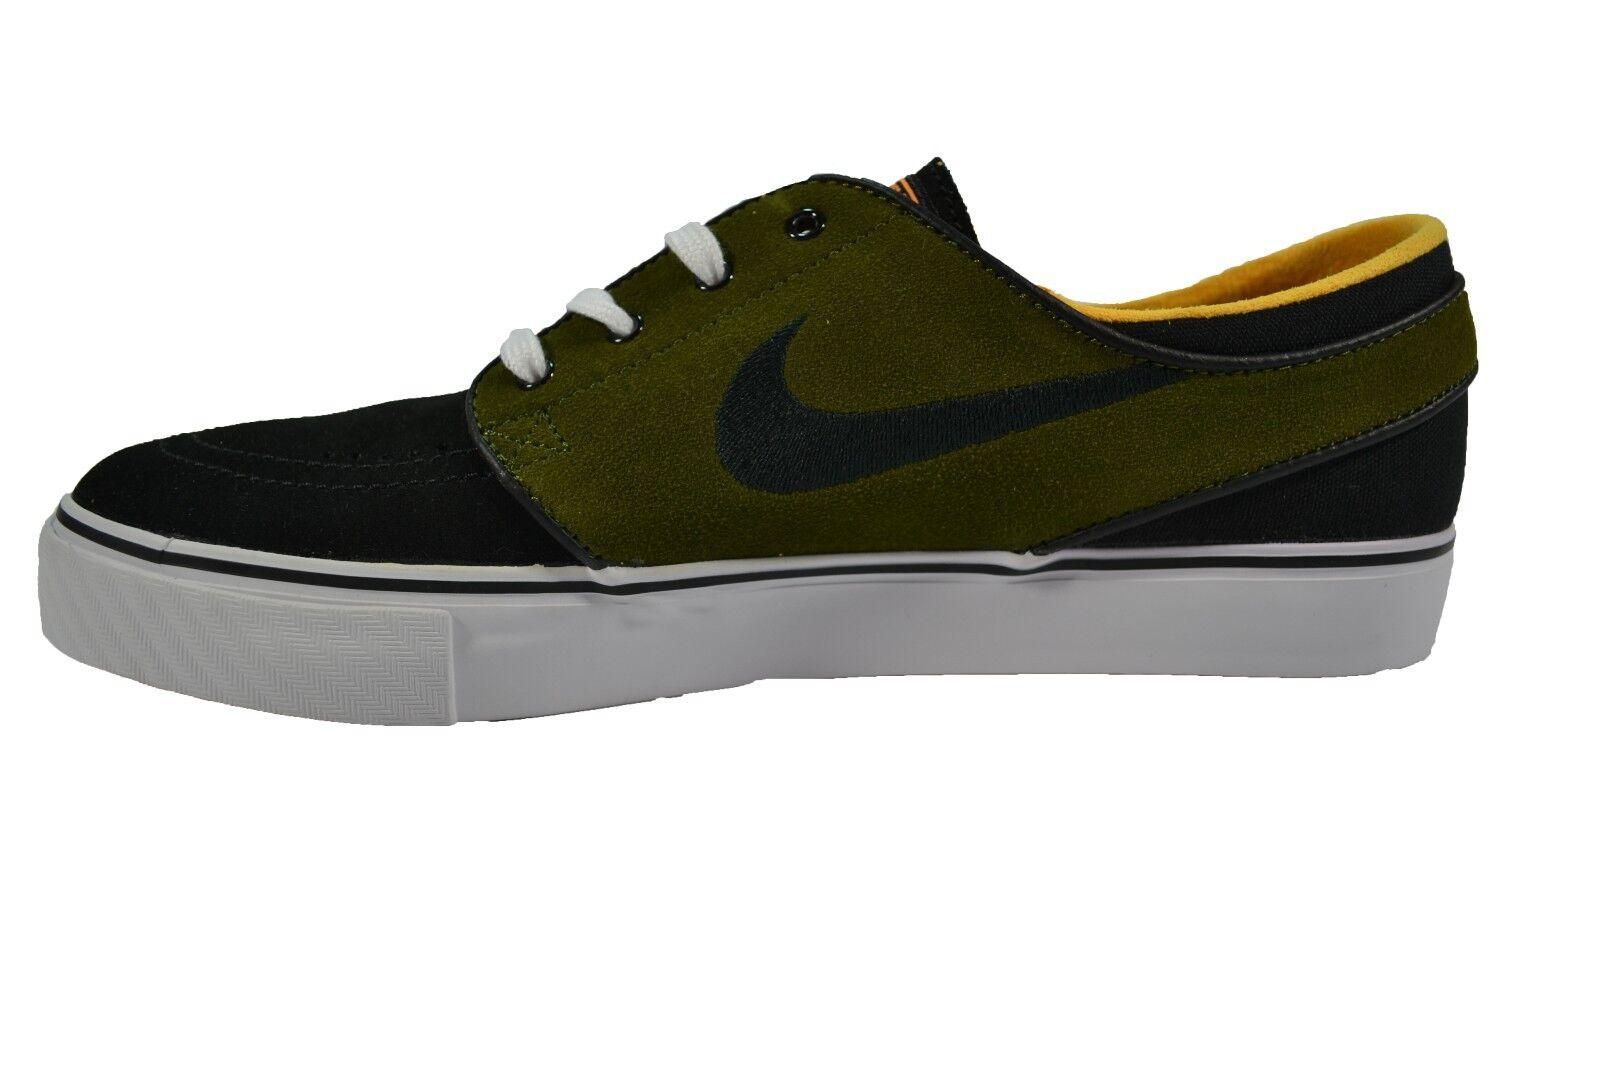 Nike zoom stefan janoski schwarze legion grünen laser - - - orange (335) männer, schuhe 5404e7